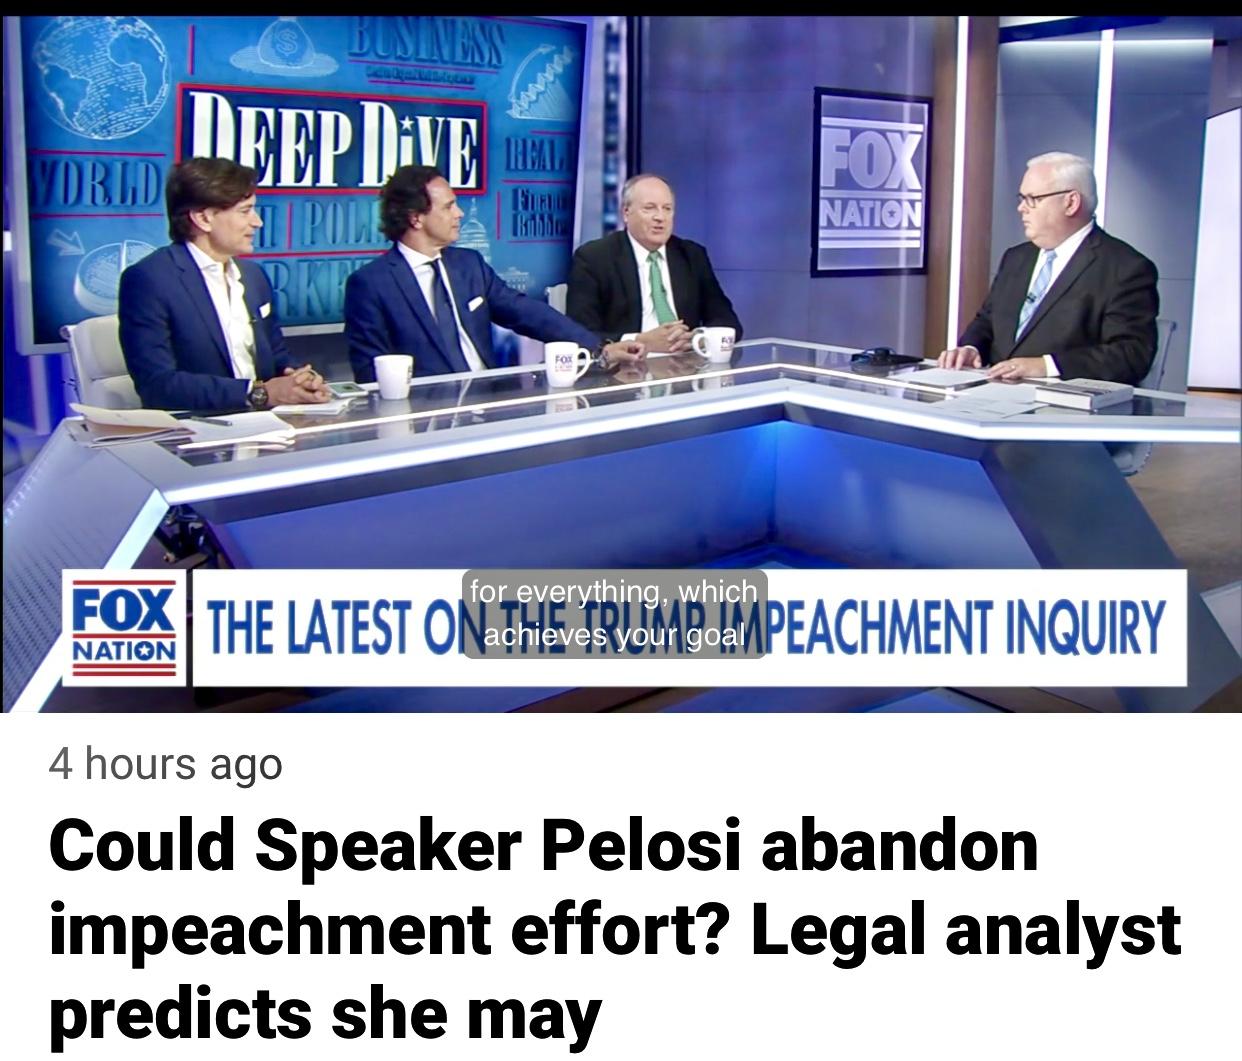 Video: Speaker Pelosi Should Abandon the Impeachment Hoax